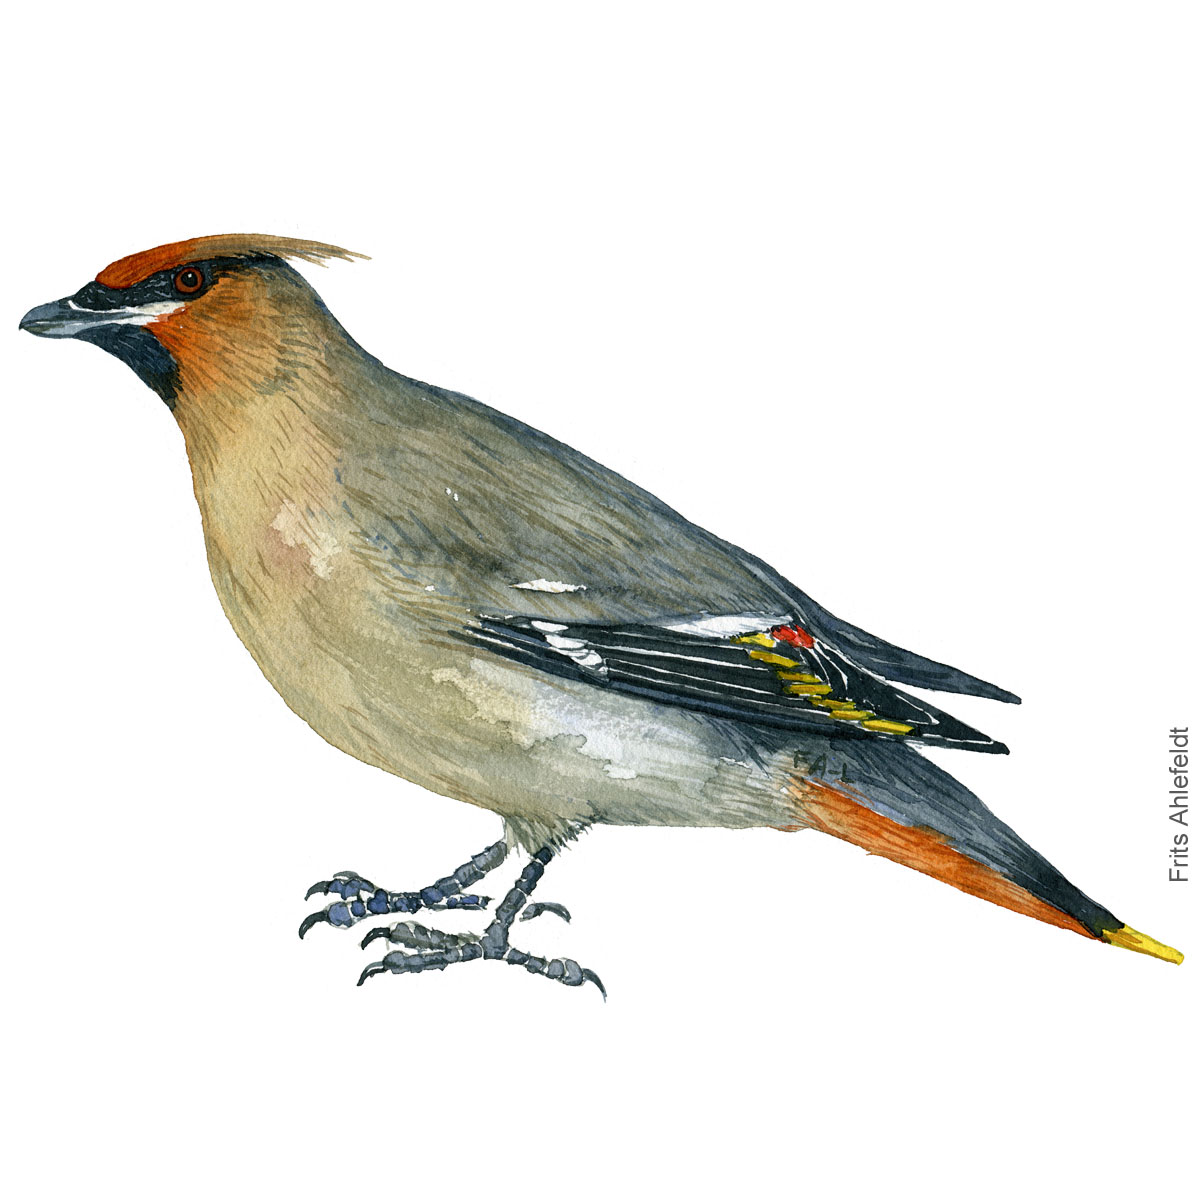 Silkehale - Bohemian waxwing bird watercolor illustration. Painting by Frits Ahlefeldt. Fugle akvarel